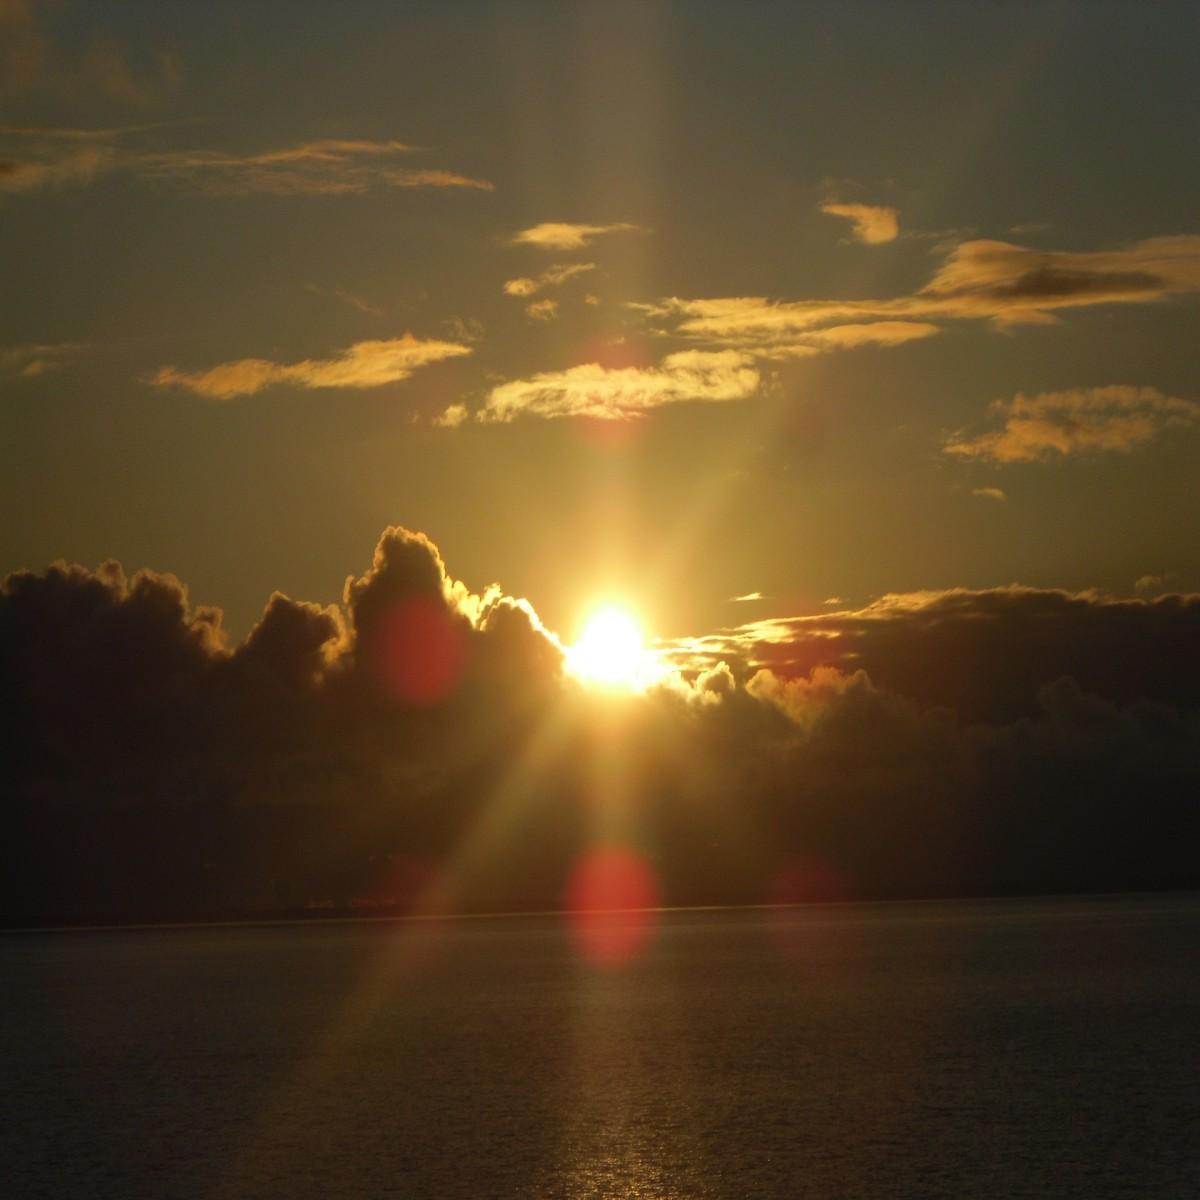 медвежата открытки восход солнца познакомитесь